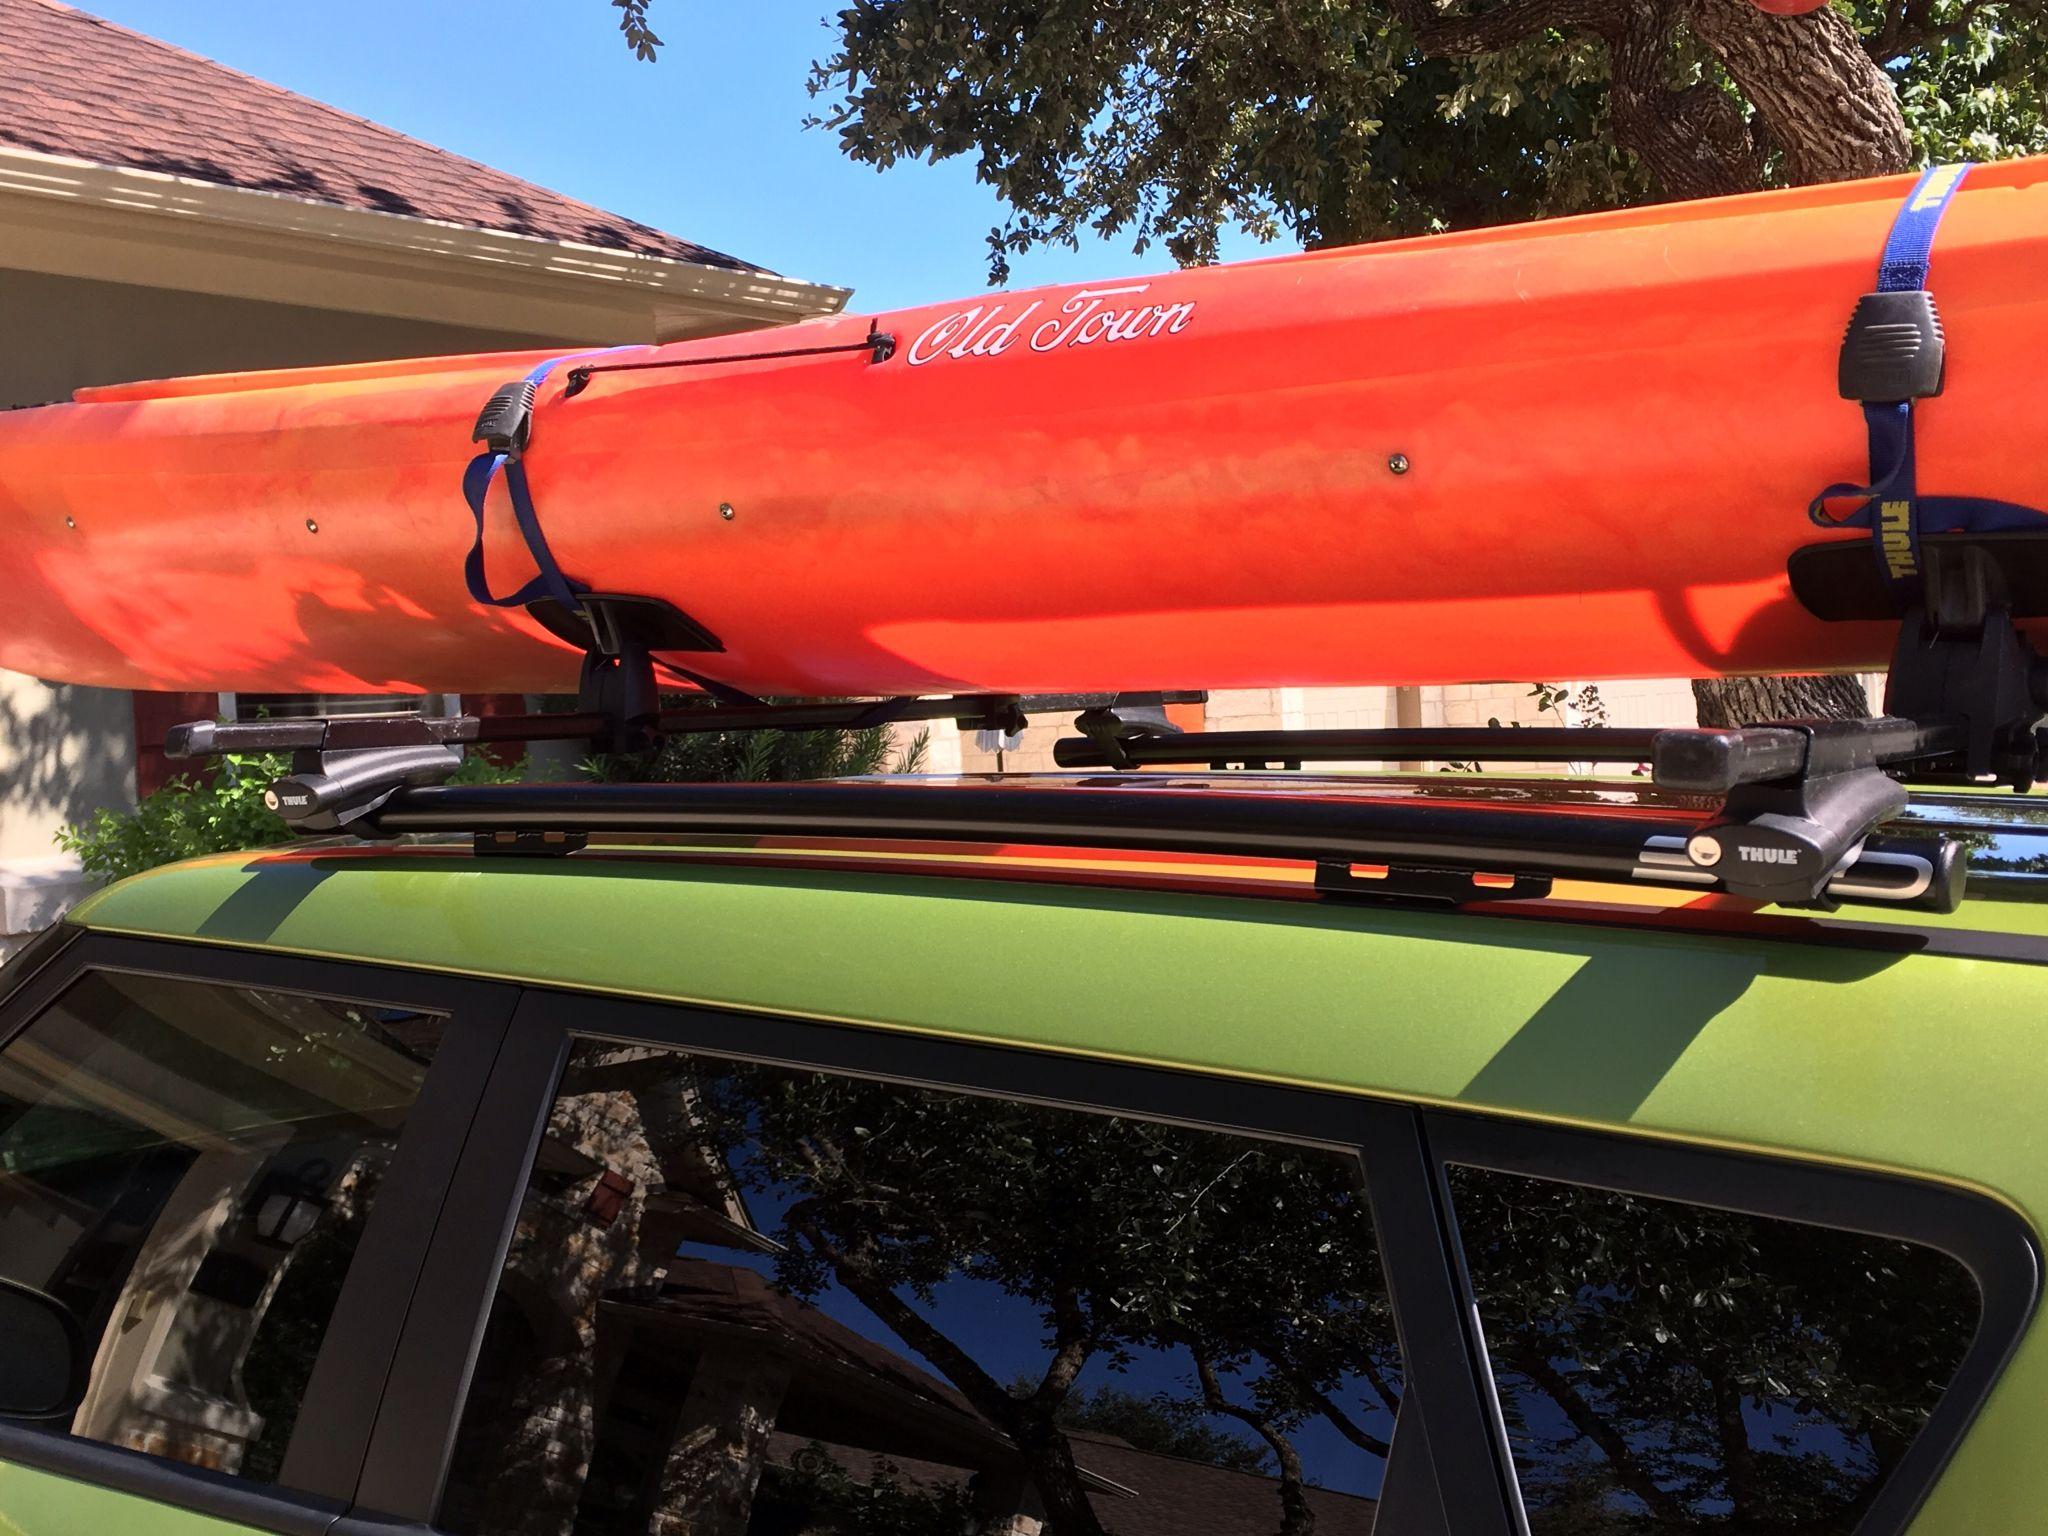 2016 Kia Soul With Ssd Roof Rails And Thule Racks 15 Olde Town Tandem Kayak Old Town Kayak Kayaking Tandem Kayaking